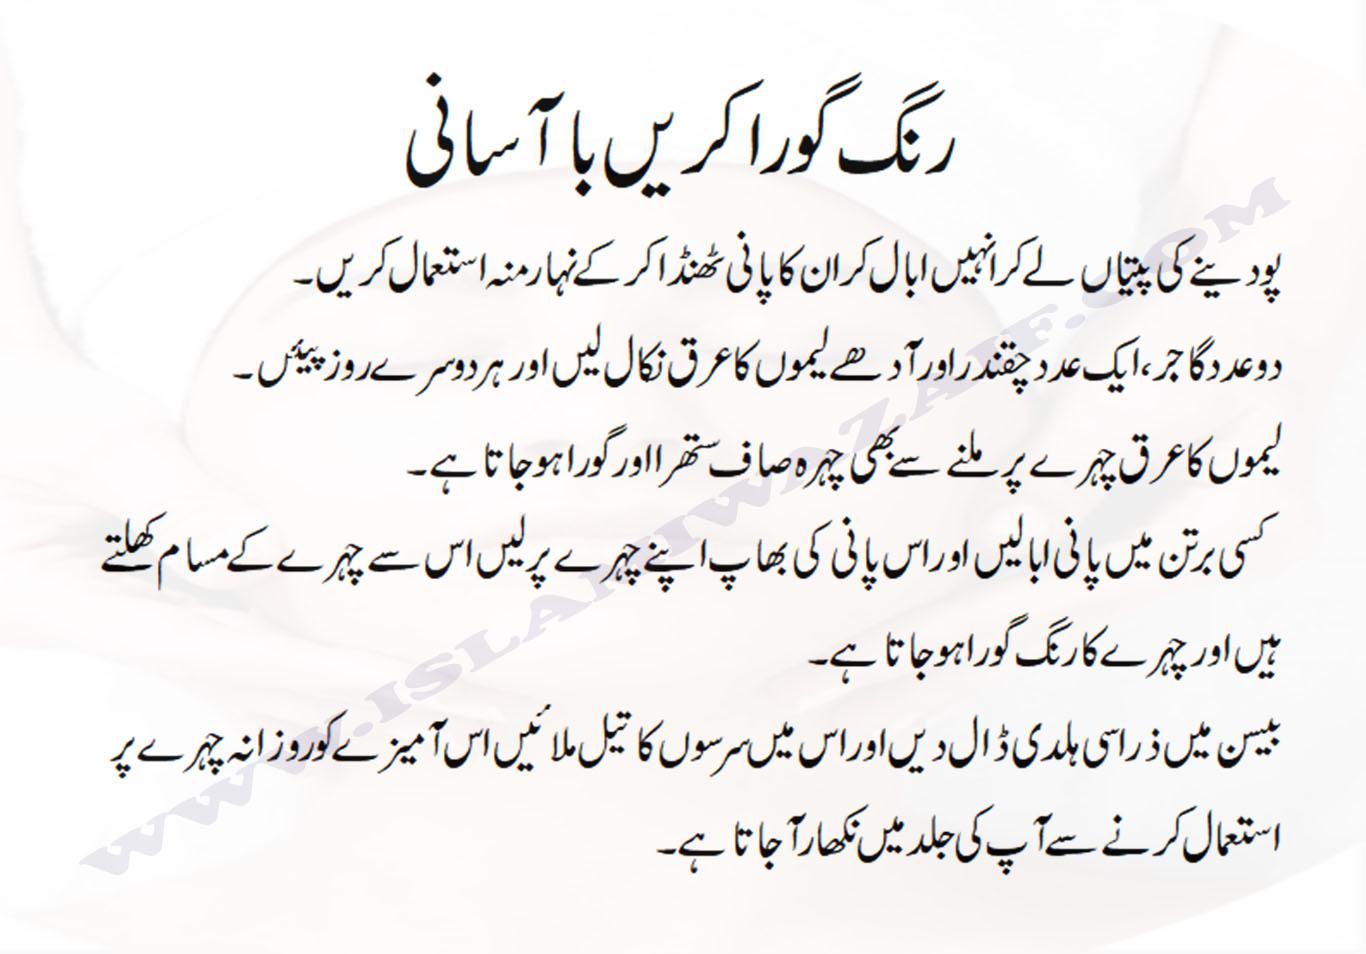 Face Whitening Tips At Home Naturally - IslamiWazaif